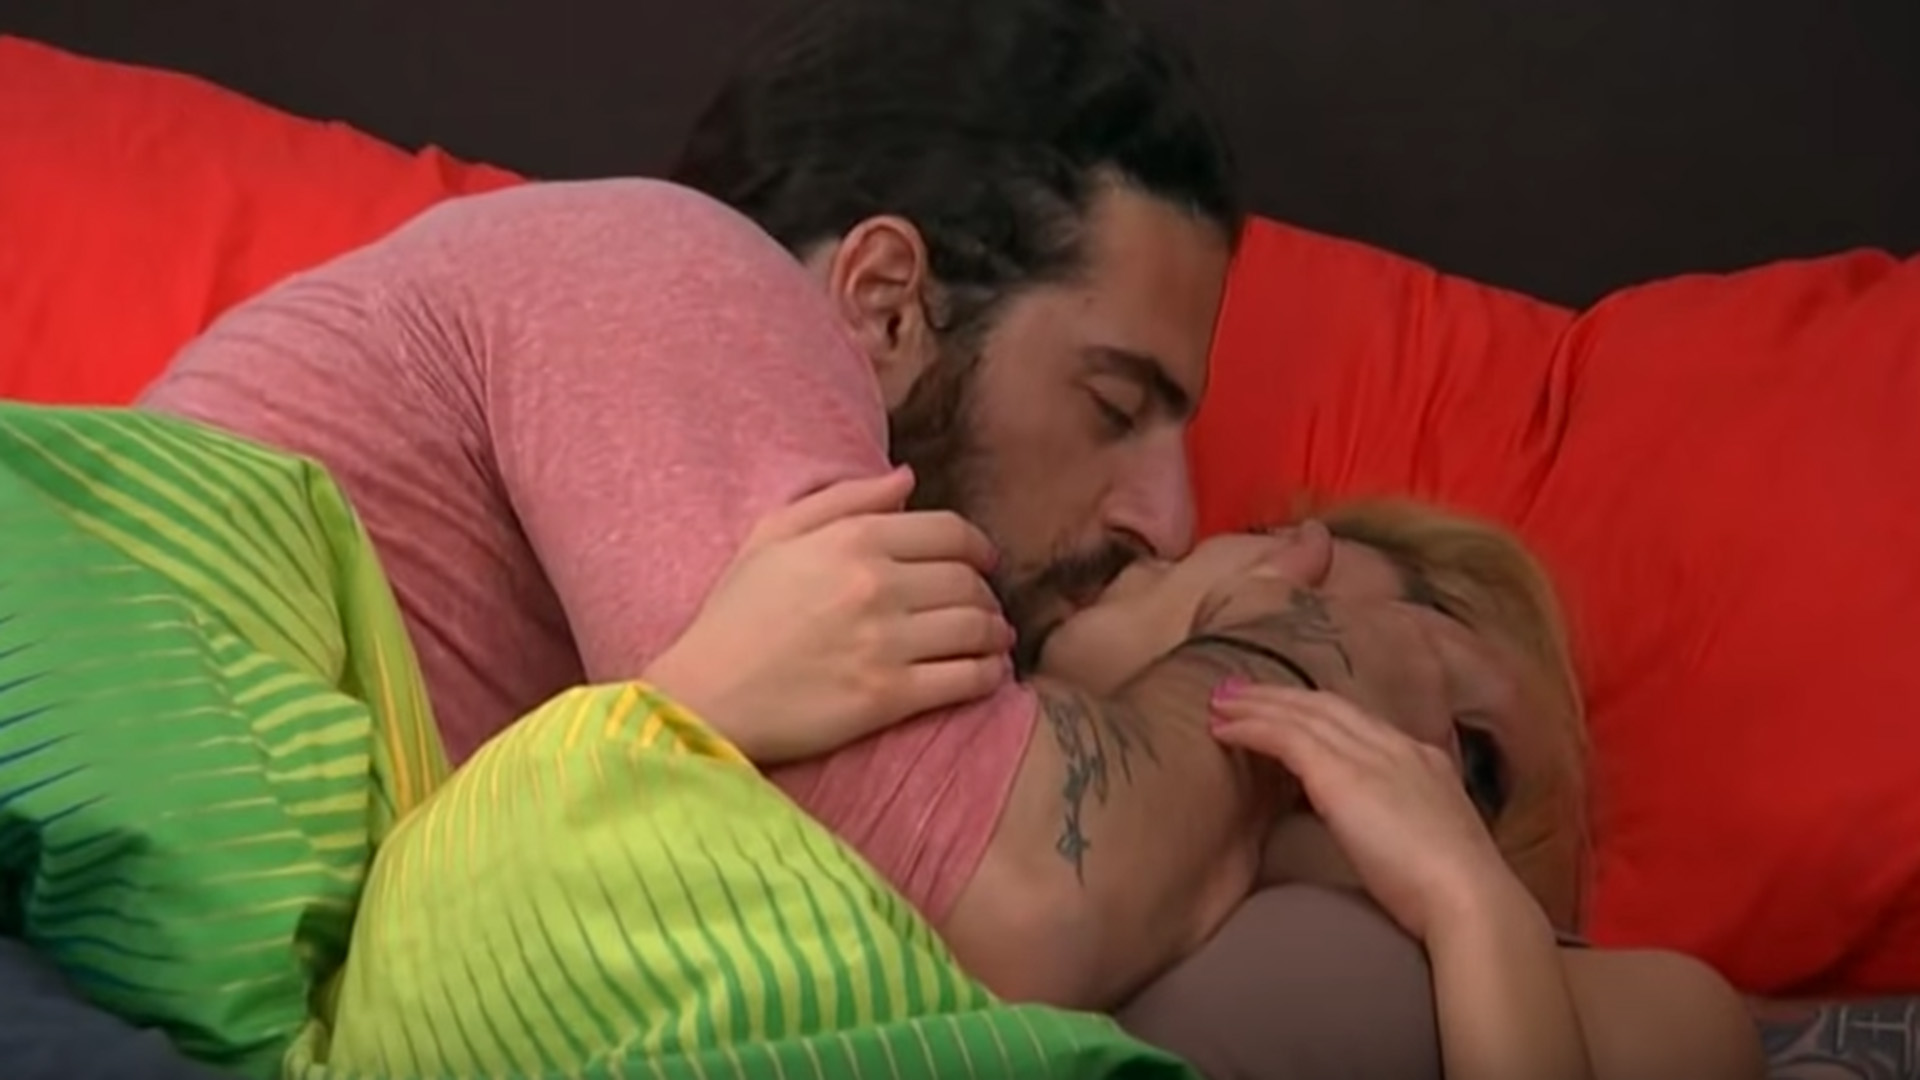 4. Austin steals his first kiss from Liz.